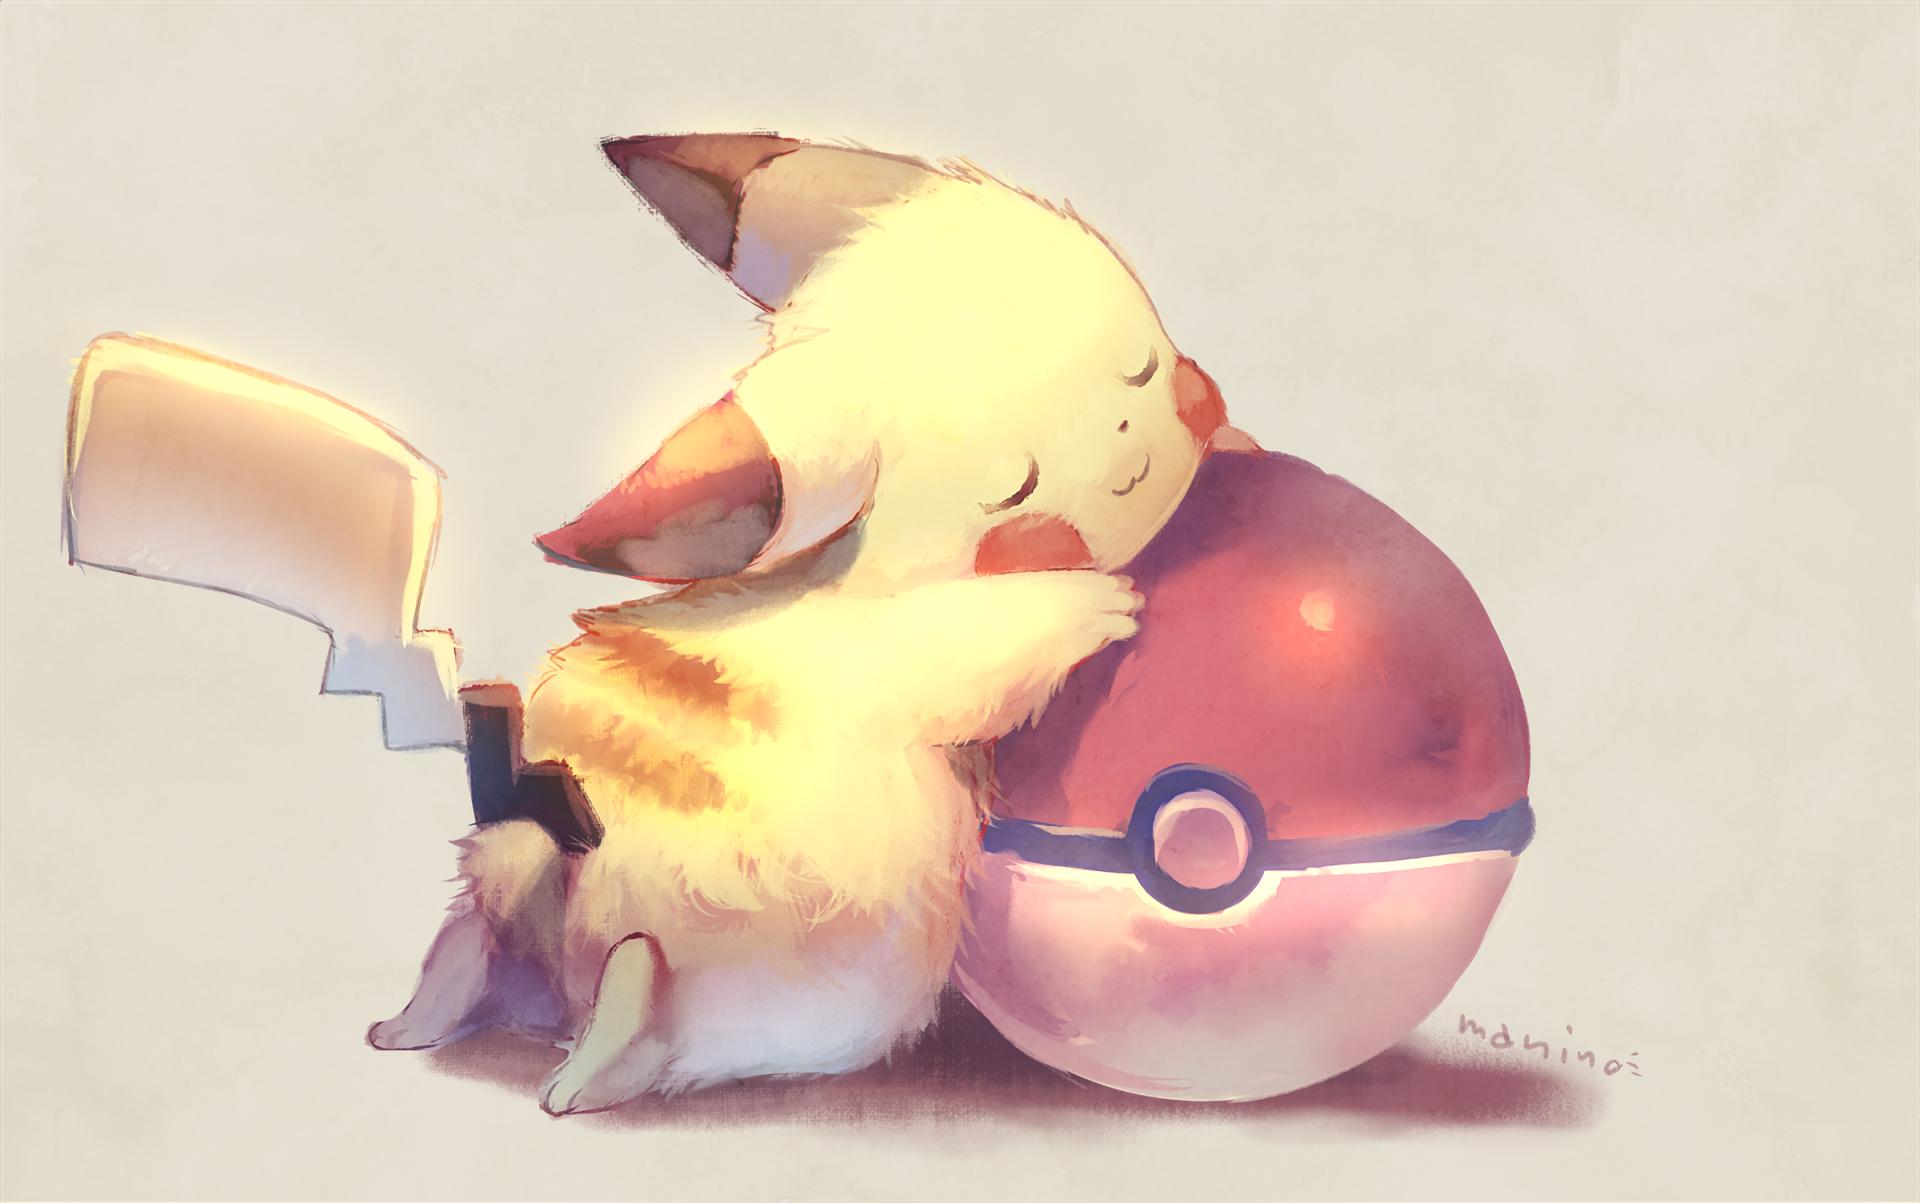 Anime 1920x1203 Pikachu Pokémon Pokéballs sleeping closed eyes